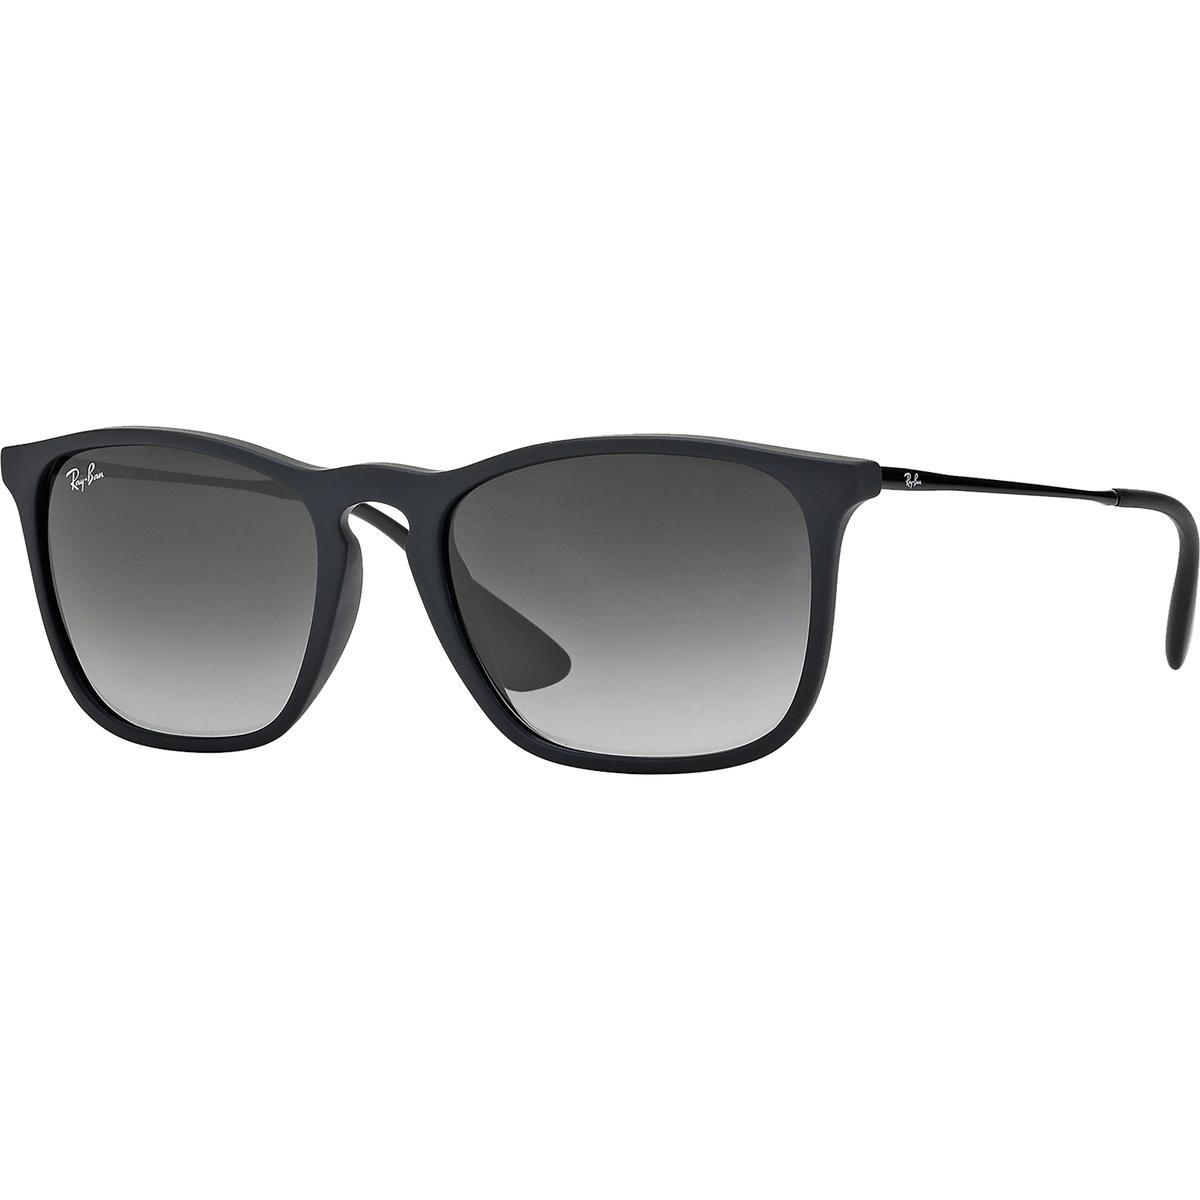 cf8717d85e93f Ray-Ban Chris Sunglasses - Black - 0RB41876228G